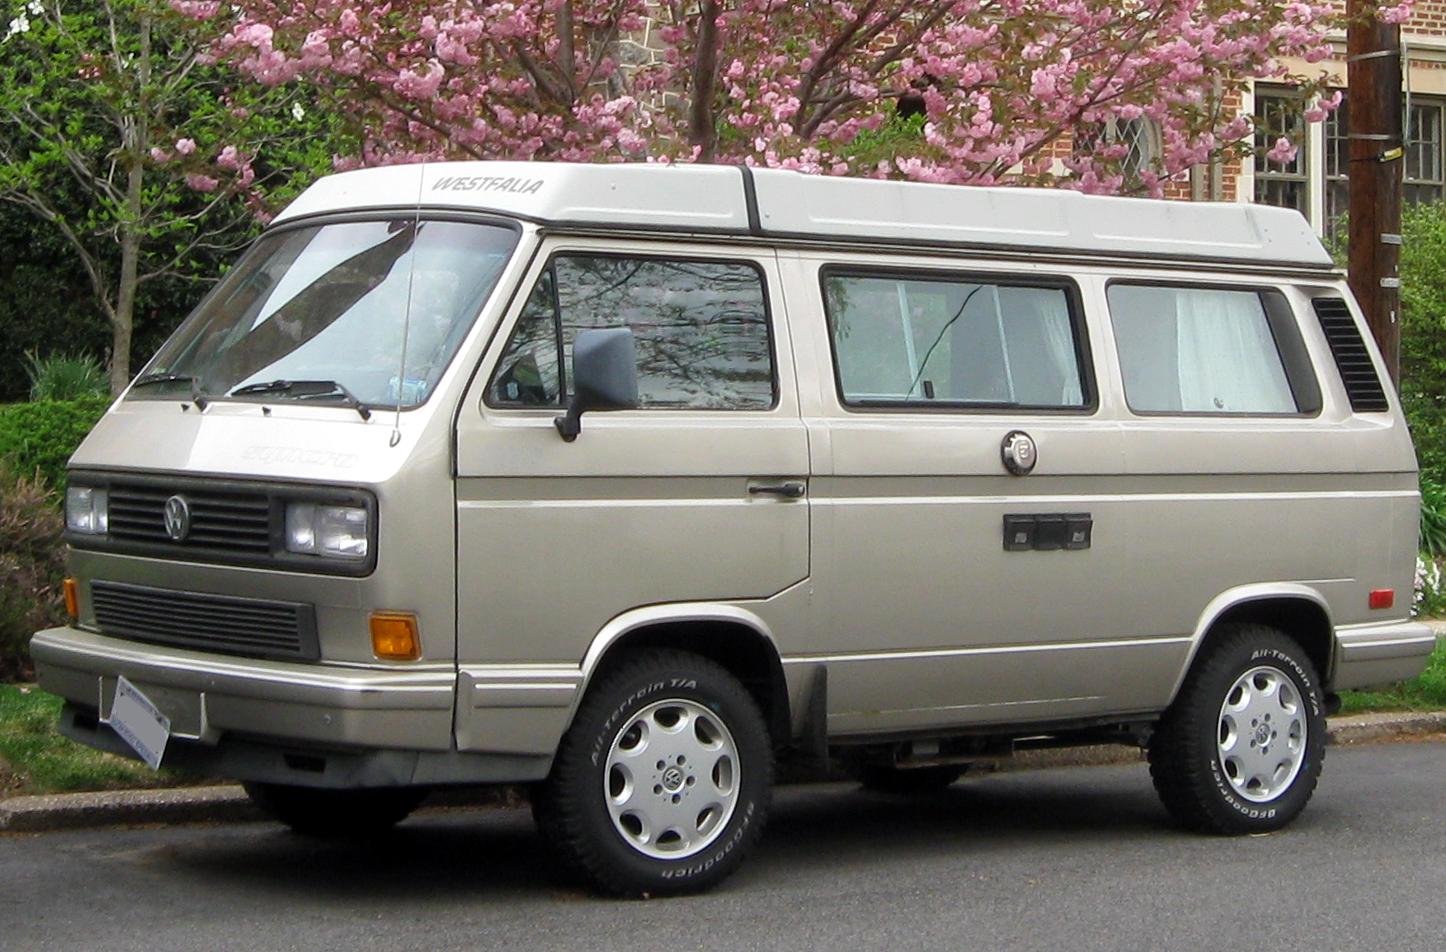 filevolkswagen vanagon westfalia   jpg wikipedia